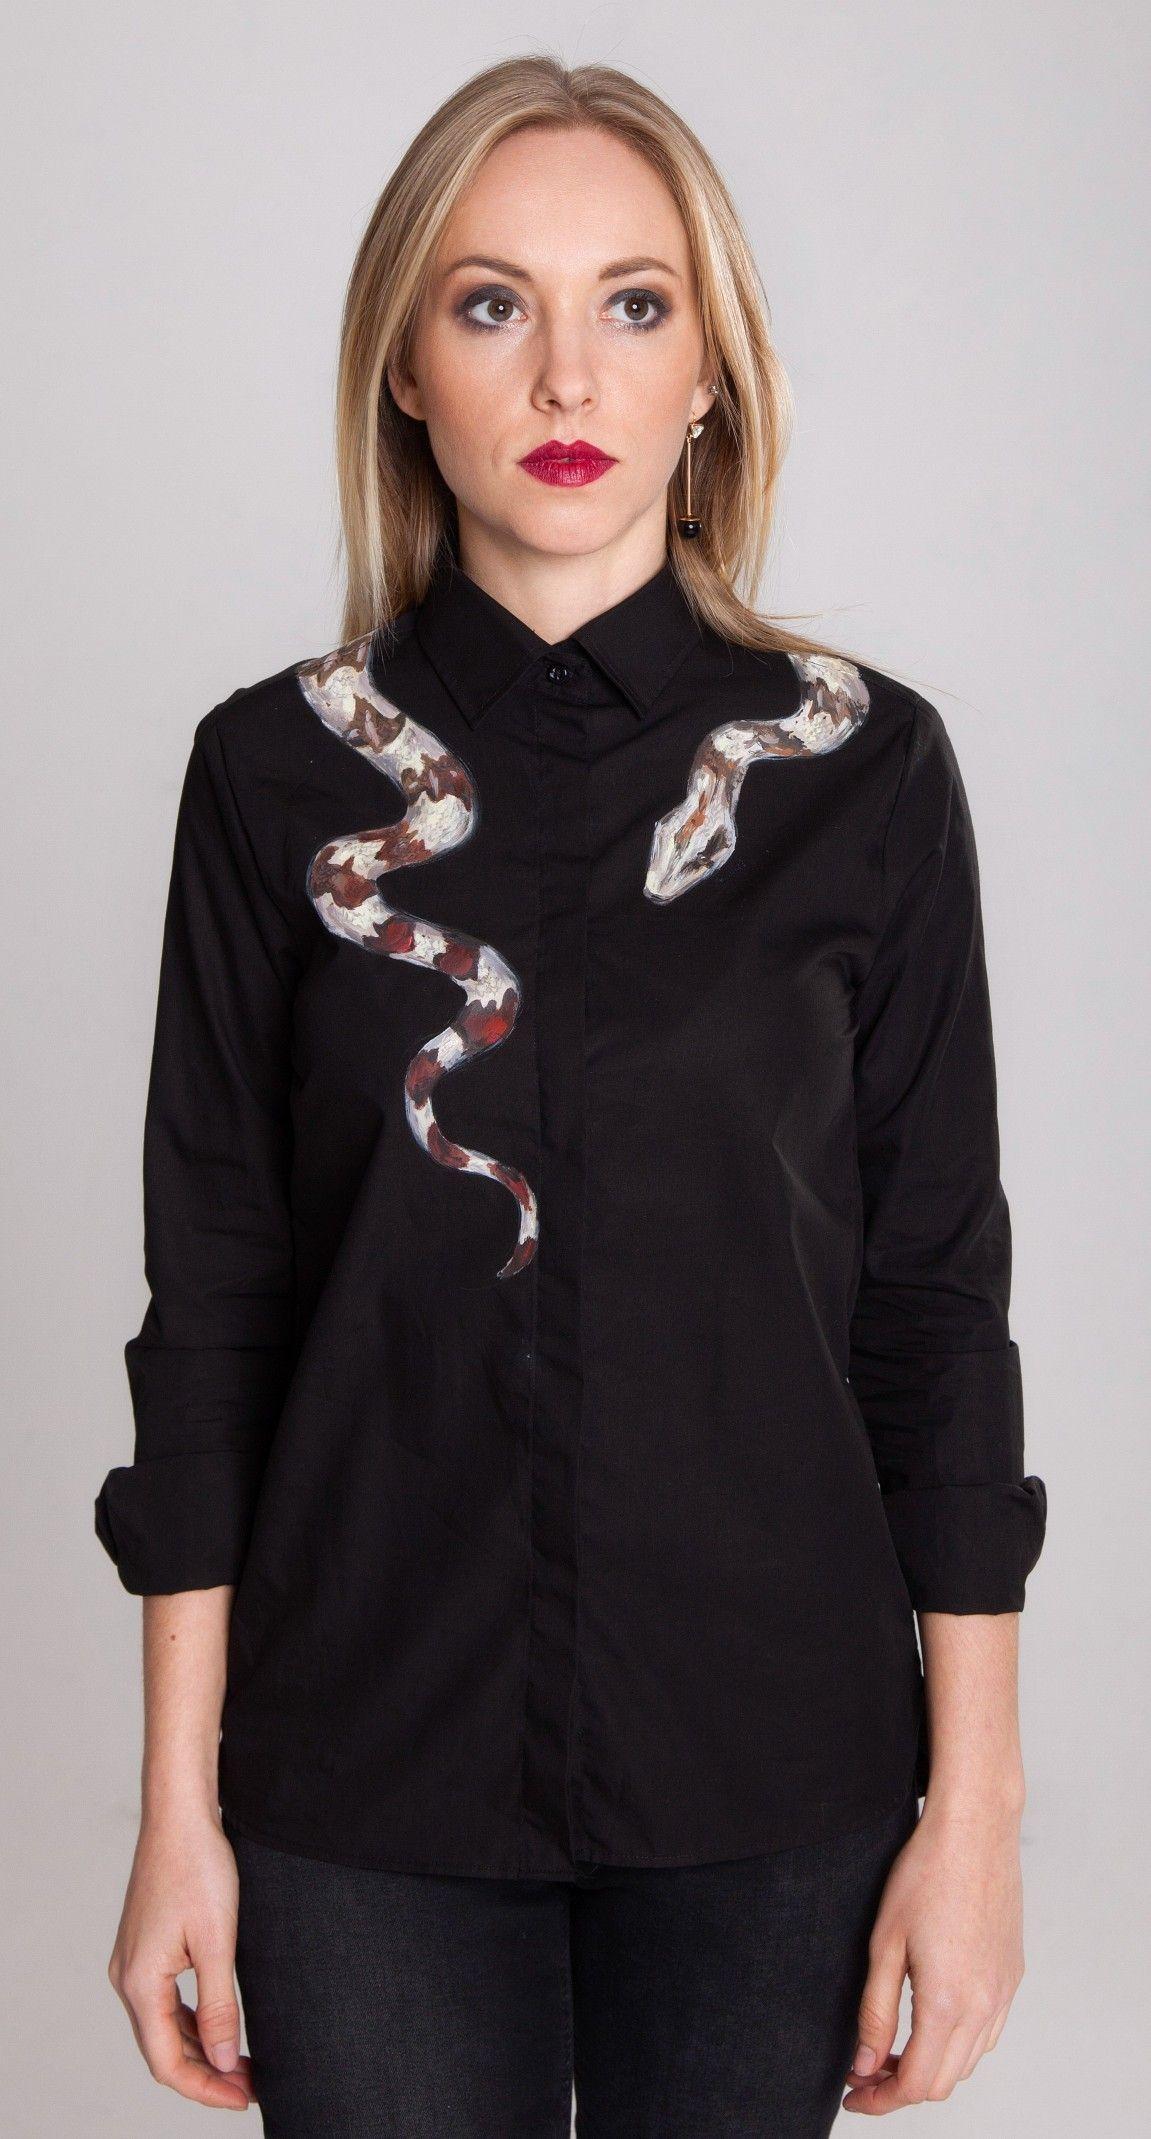 662752aa8 Snake shirt Black button up shirt Black blouse Snake blouse Designer ...